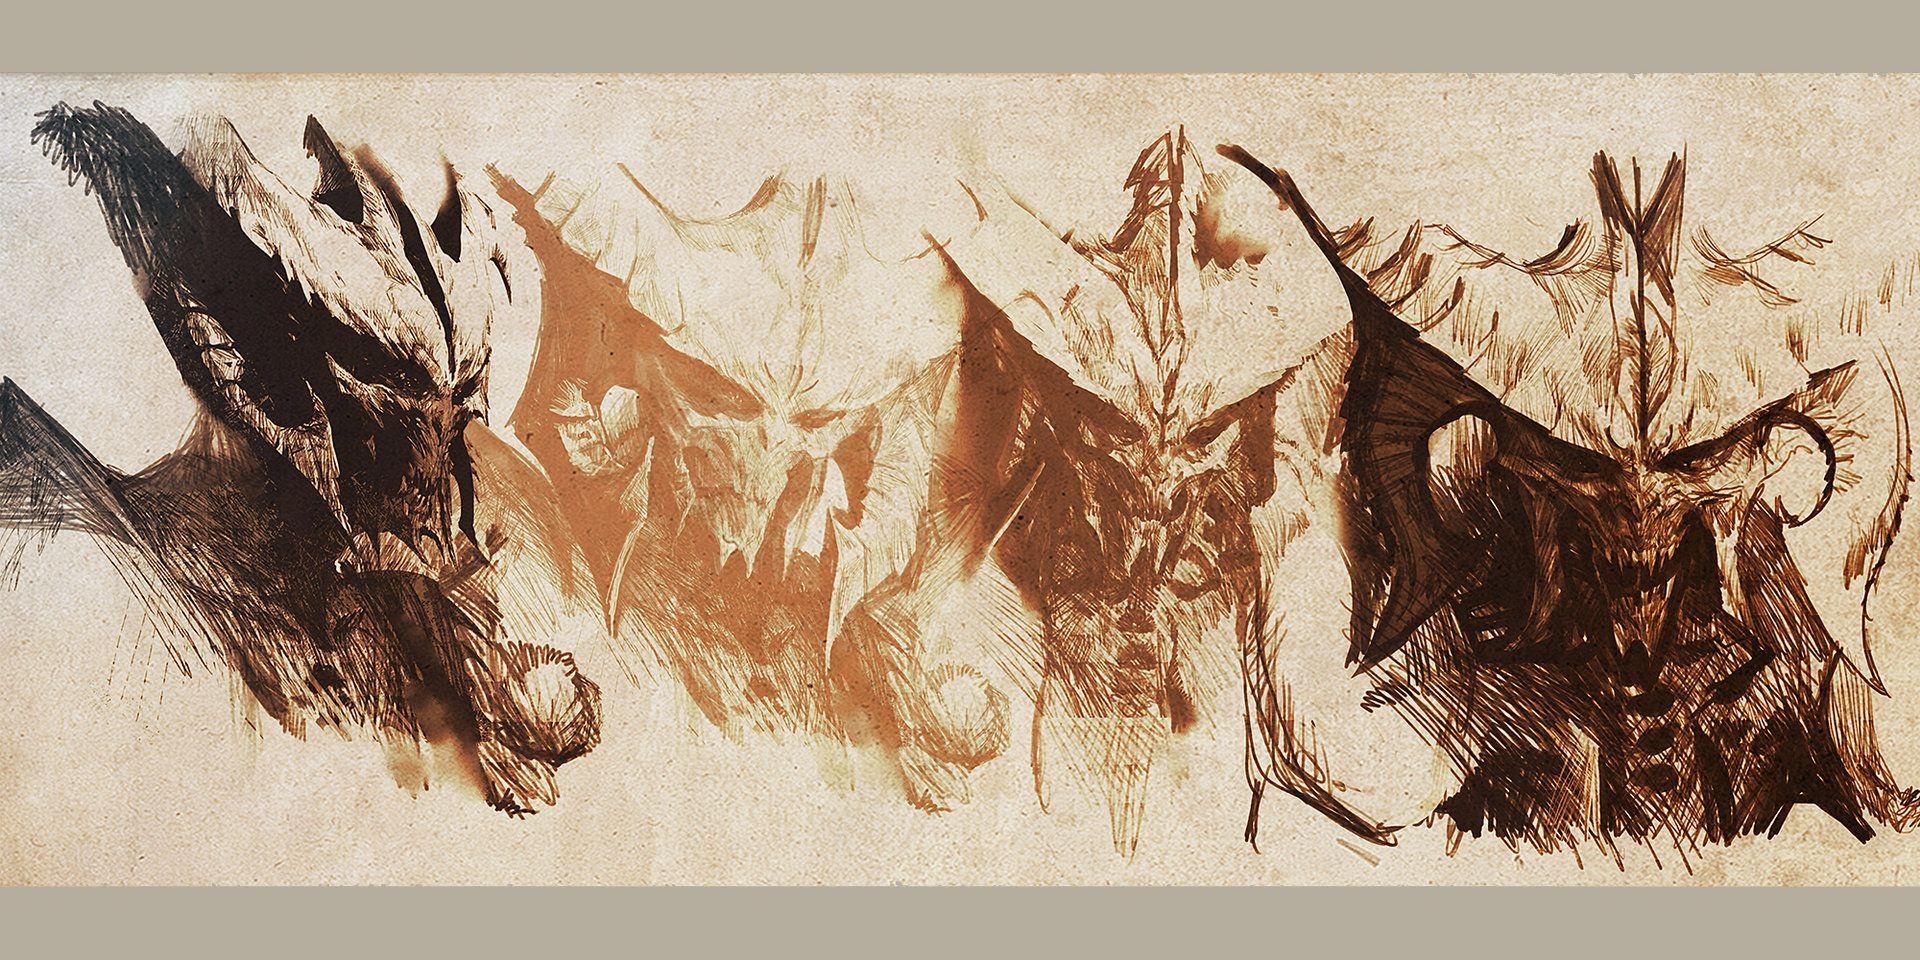 ArtStation - diablo 3 drawing, daniel chavez